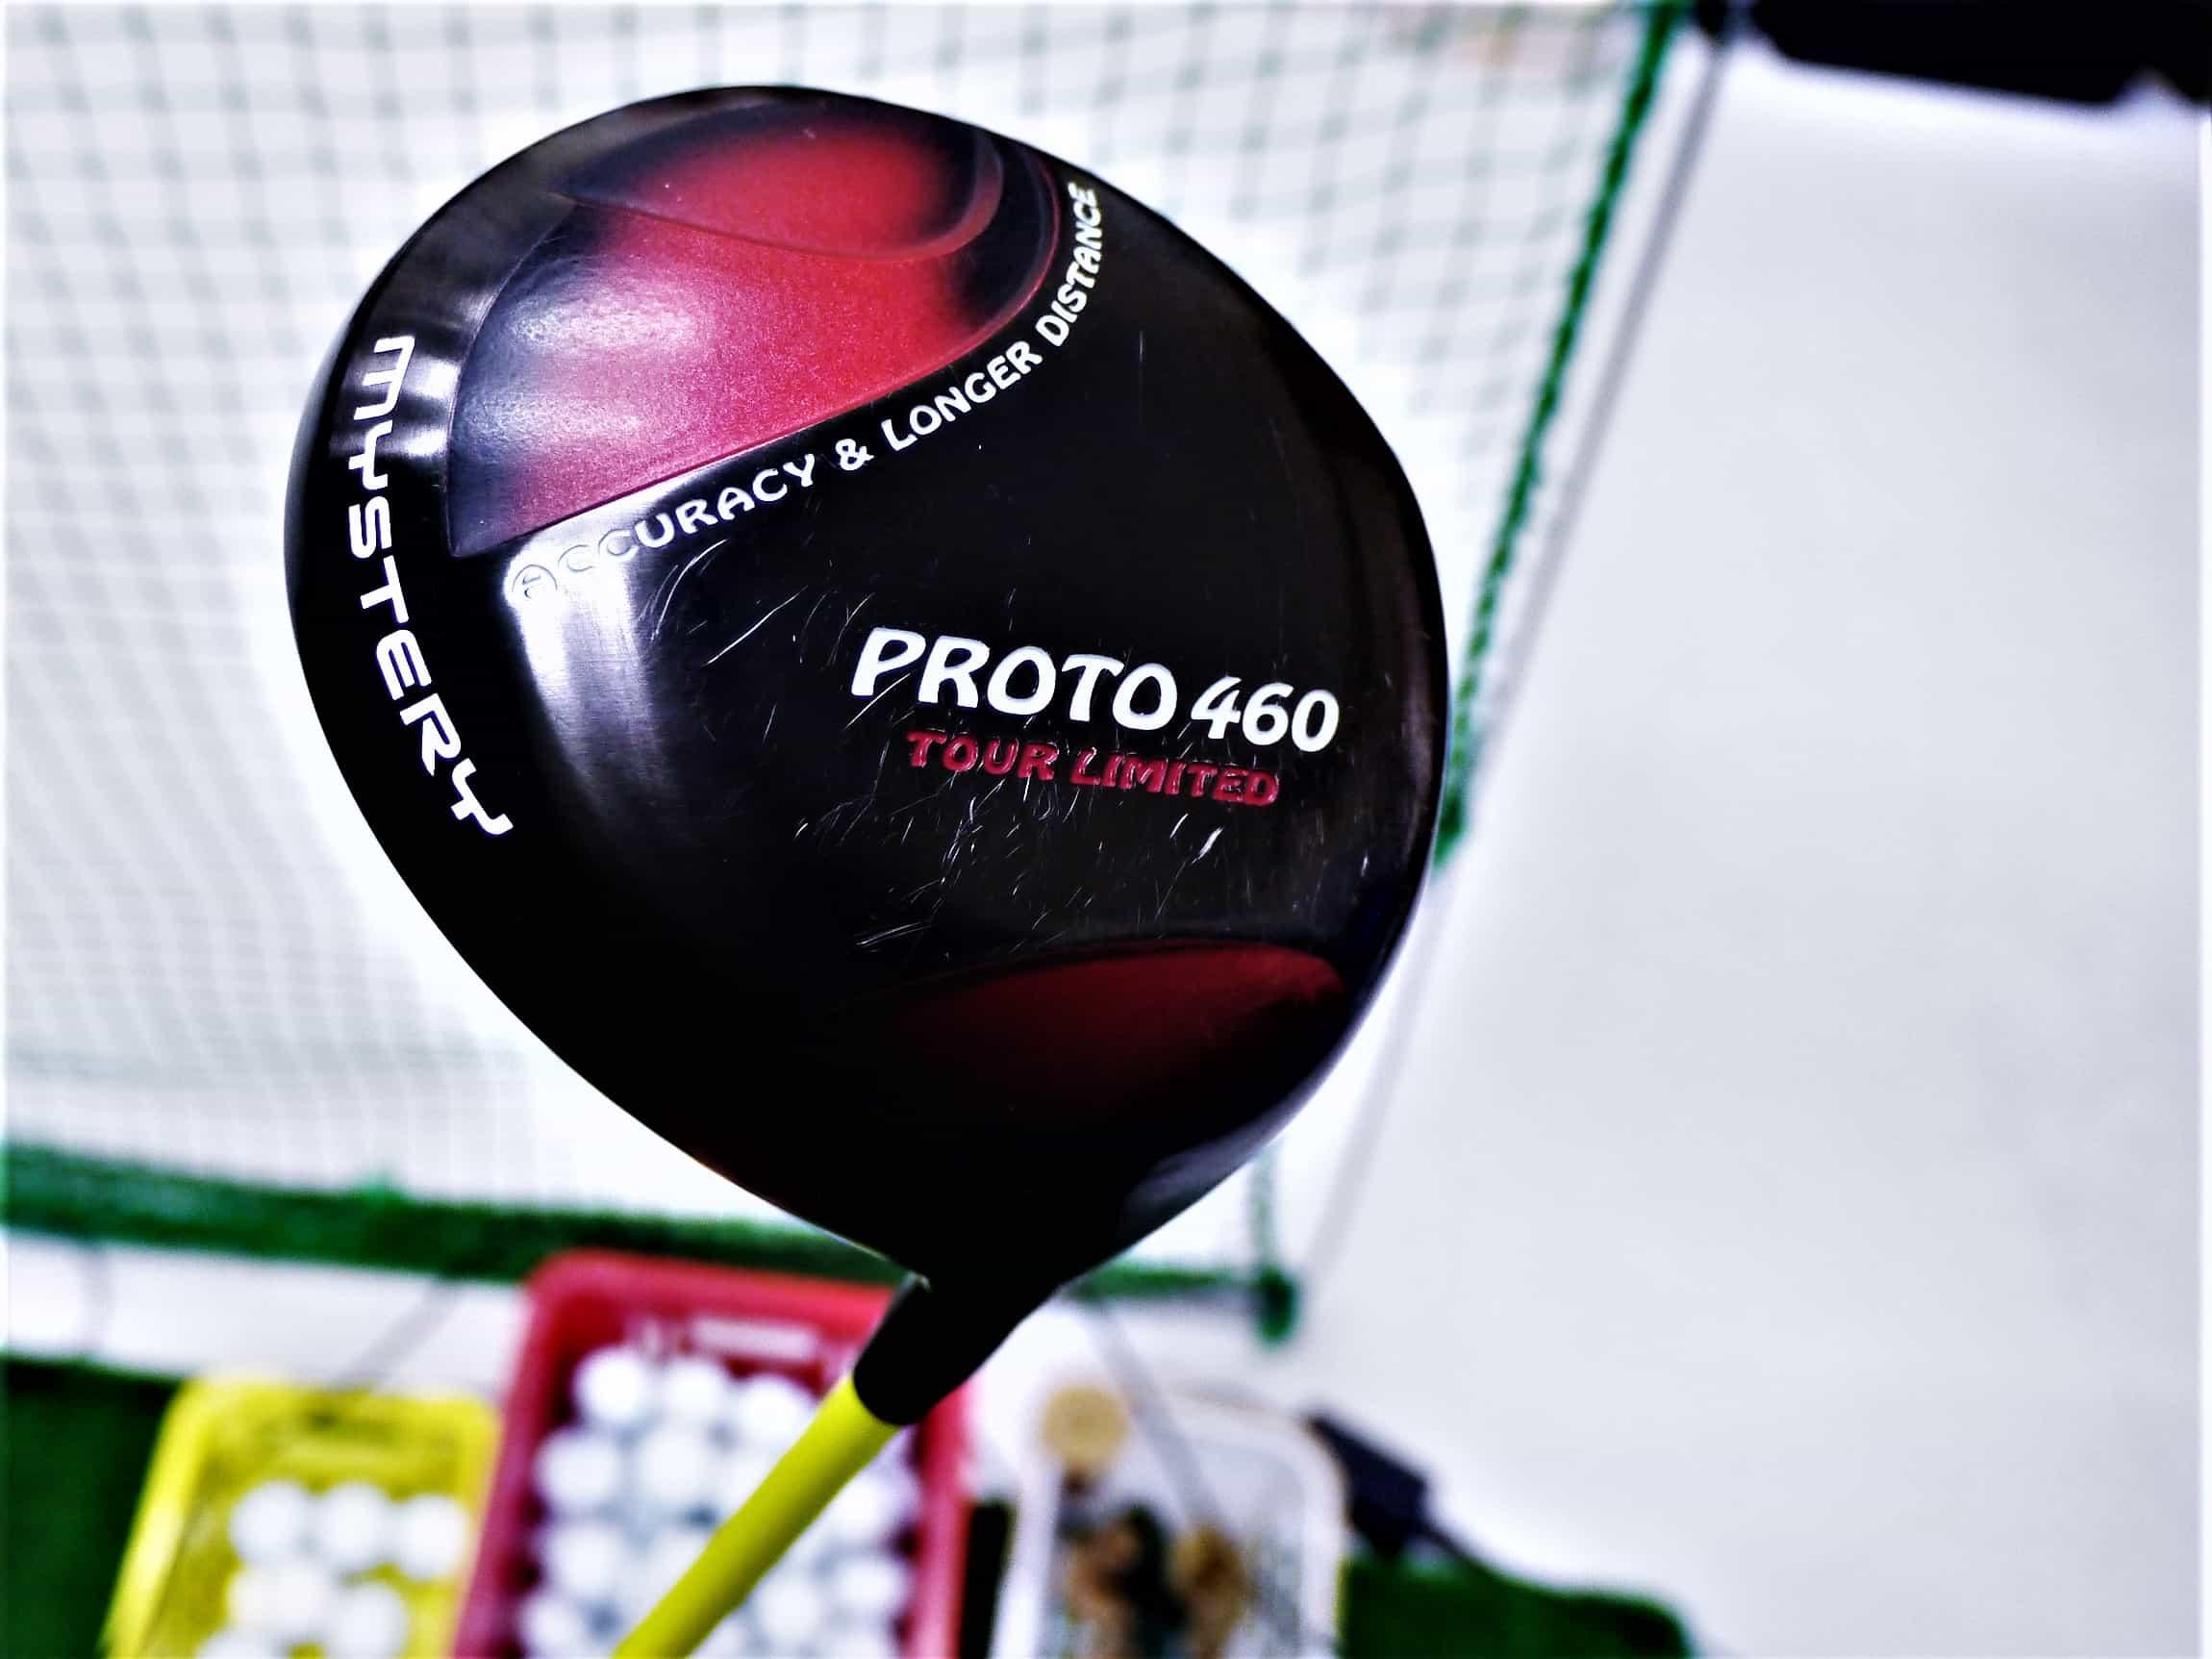 PROTO 460 Tour Limited